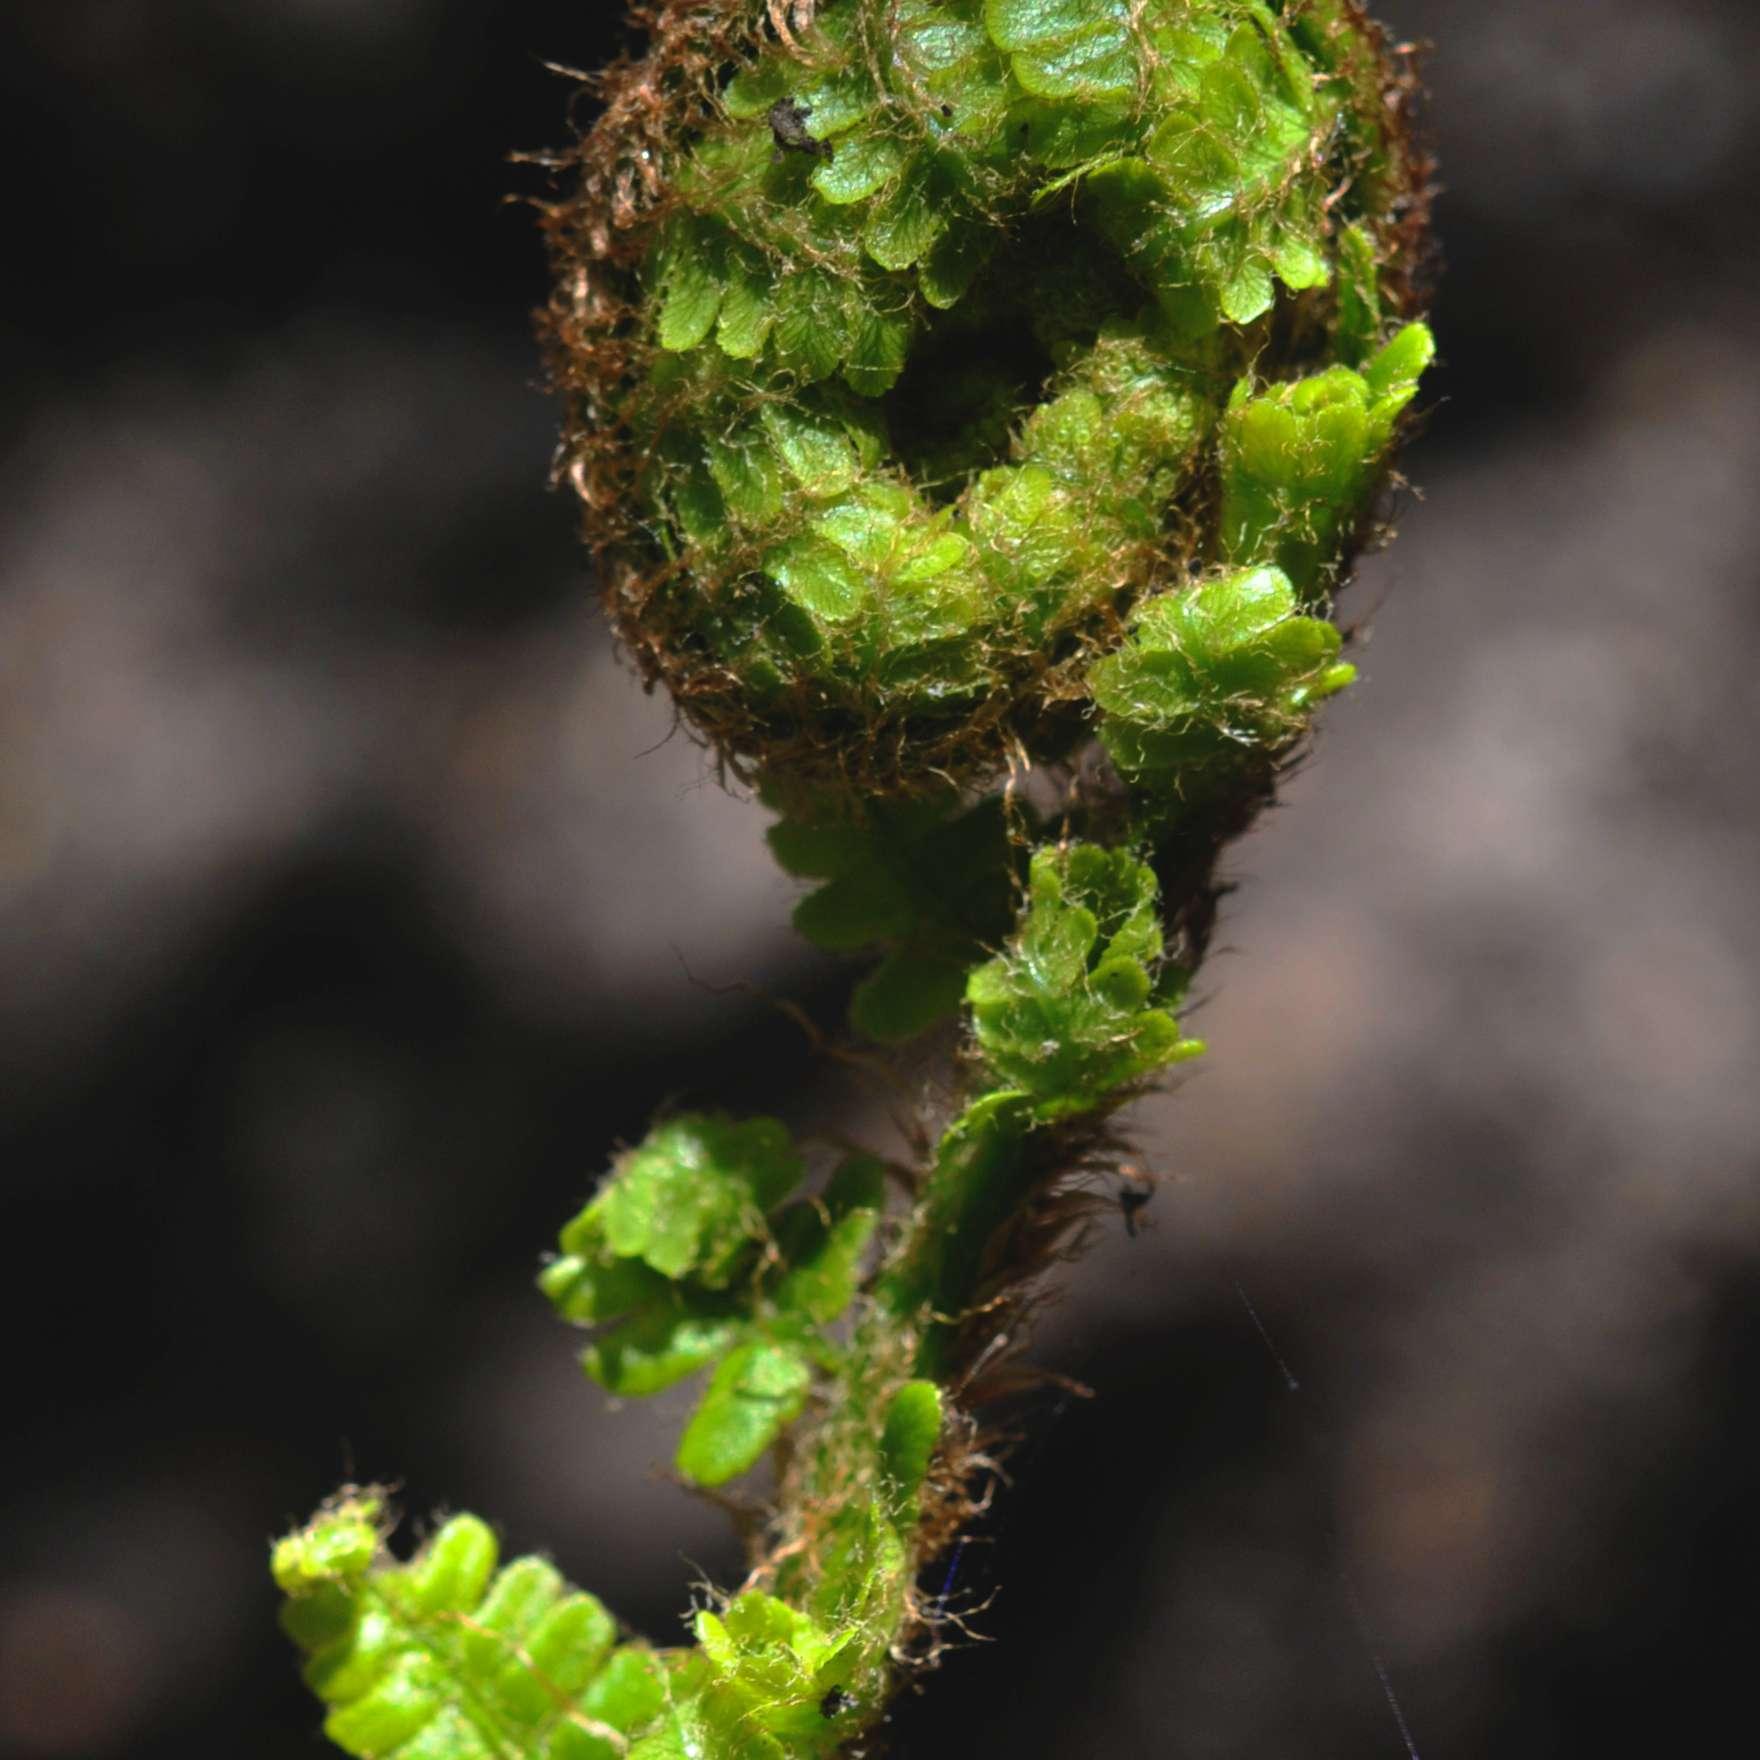 Ostrich fern frond closeup